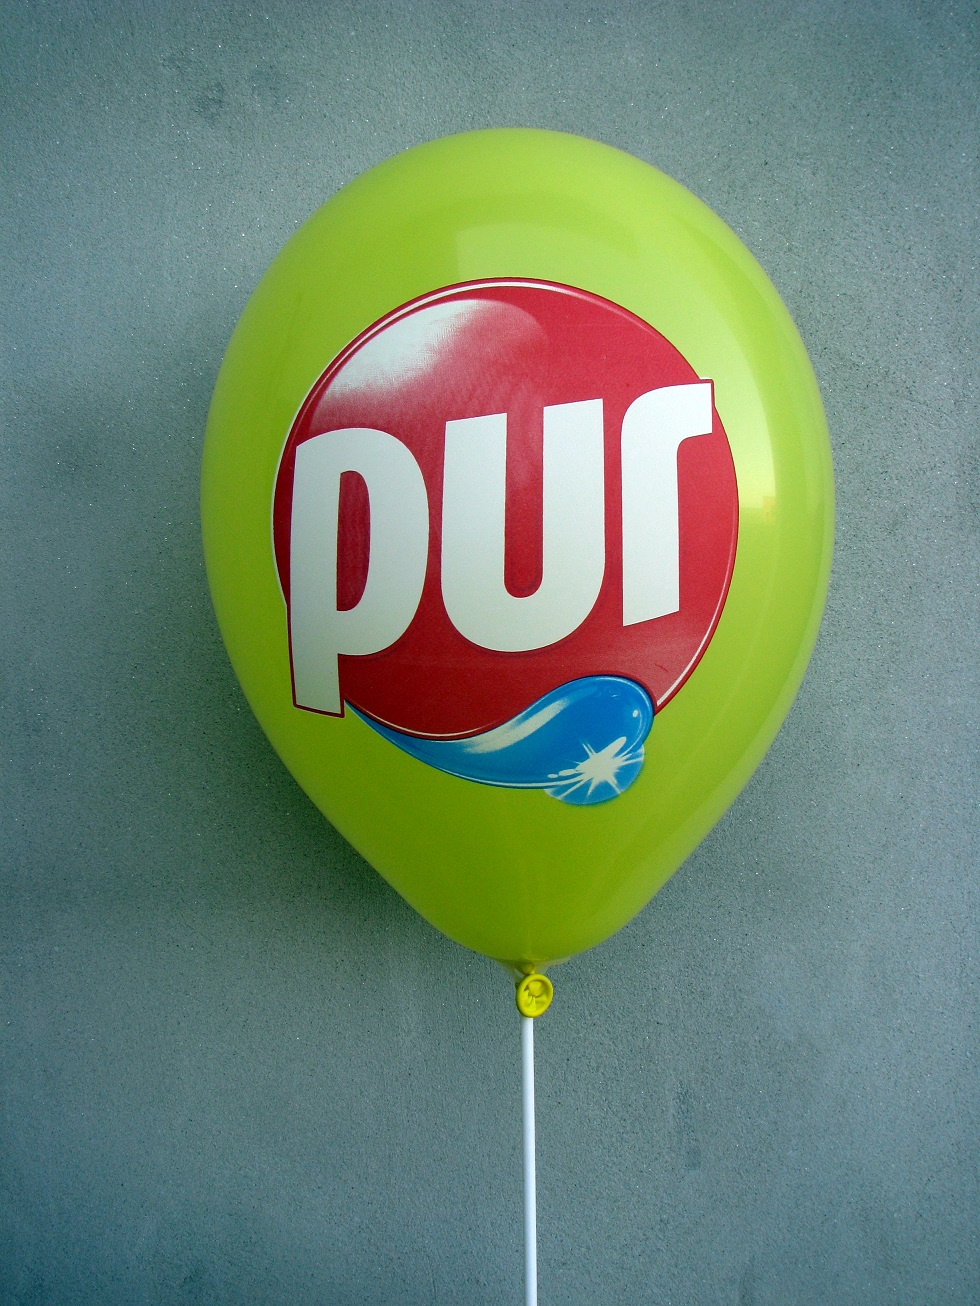 Baloane-personalizate-policromie-balon-arcada-baloane-pret-baloane-cu-heliu-baloane-imprimate-firma-baloane-Bucuresti-3